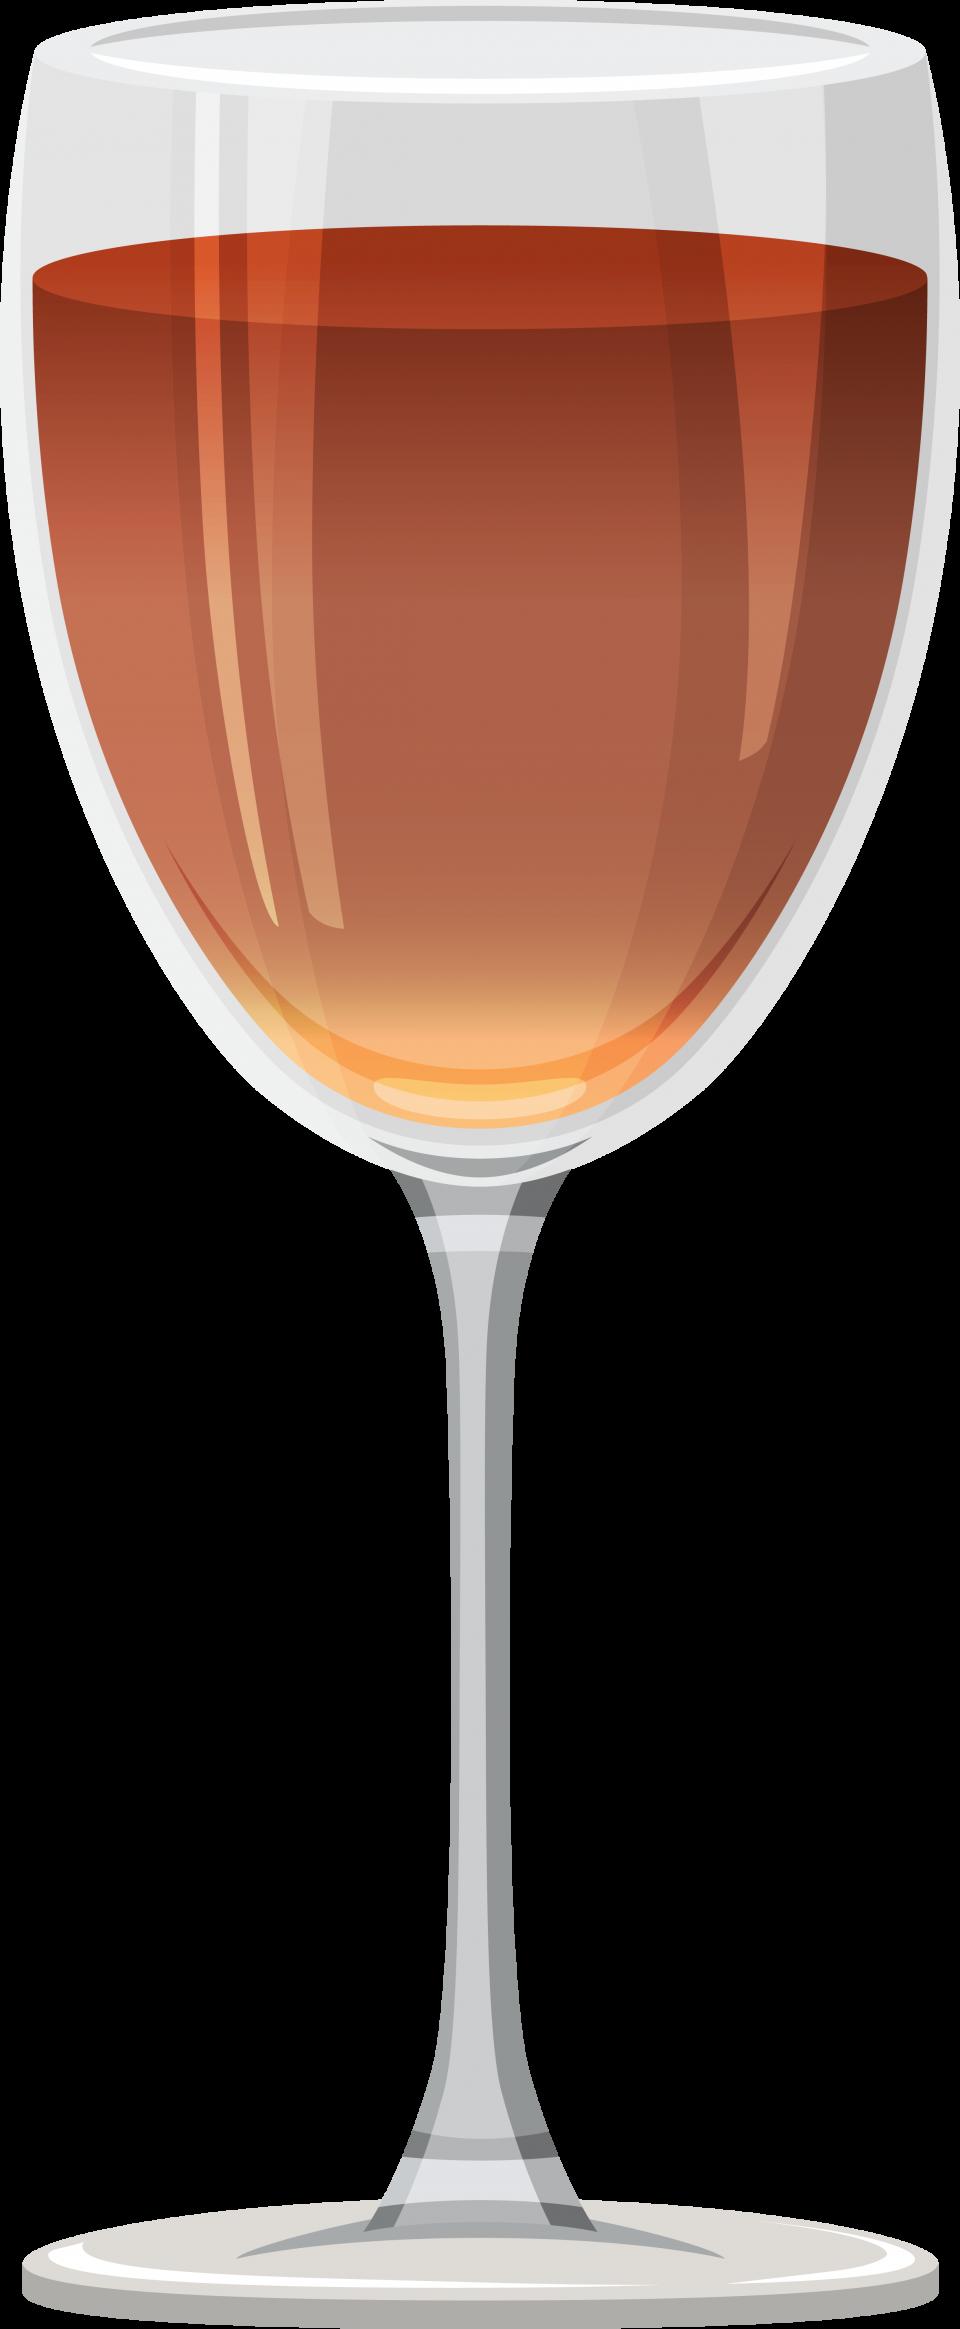 Wine Glass PNG Image - PurePNG | Free transparent CC0 PNG ...